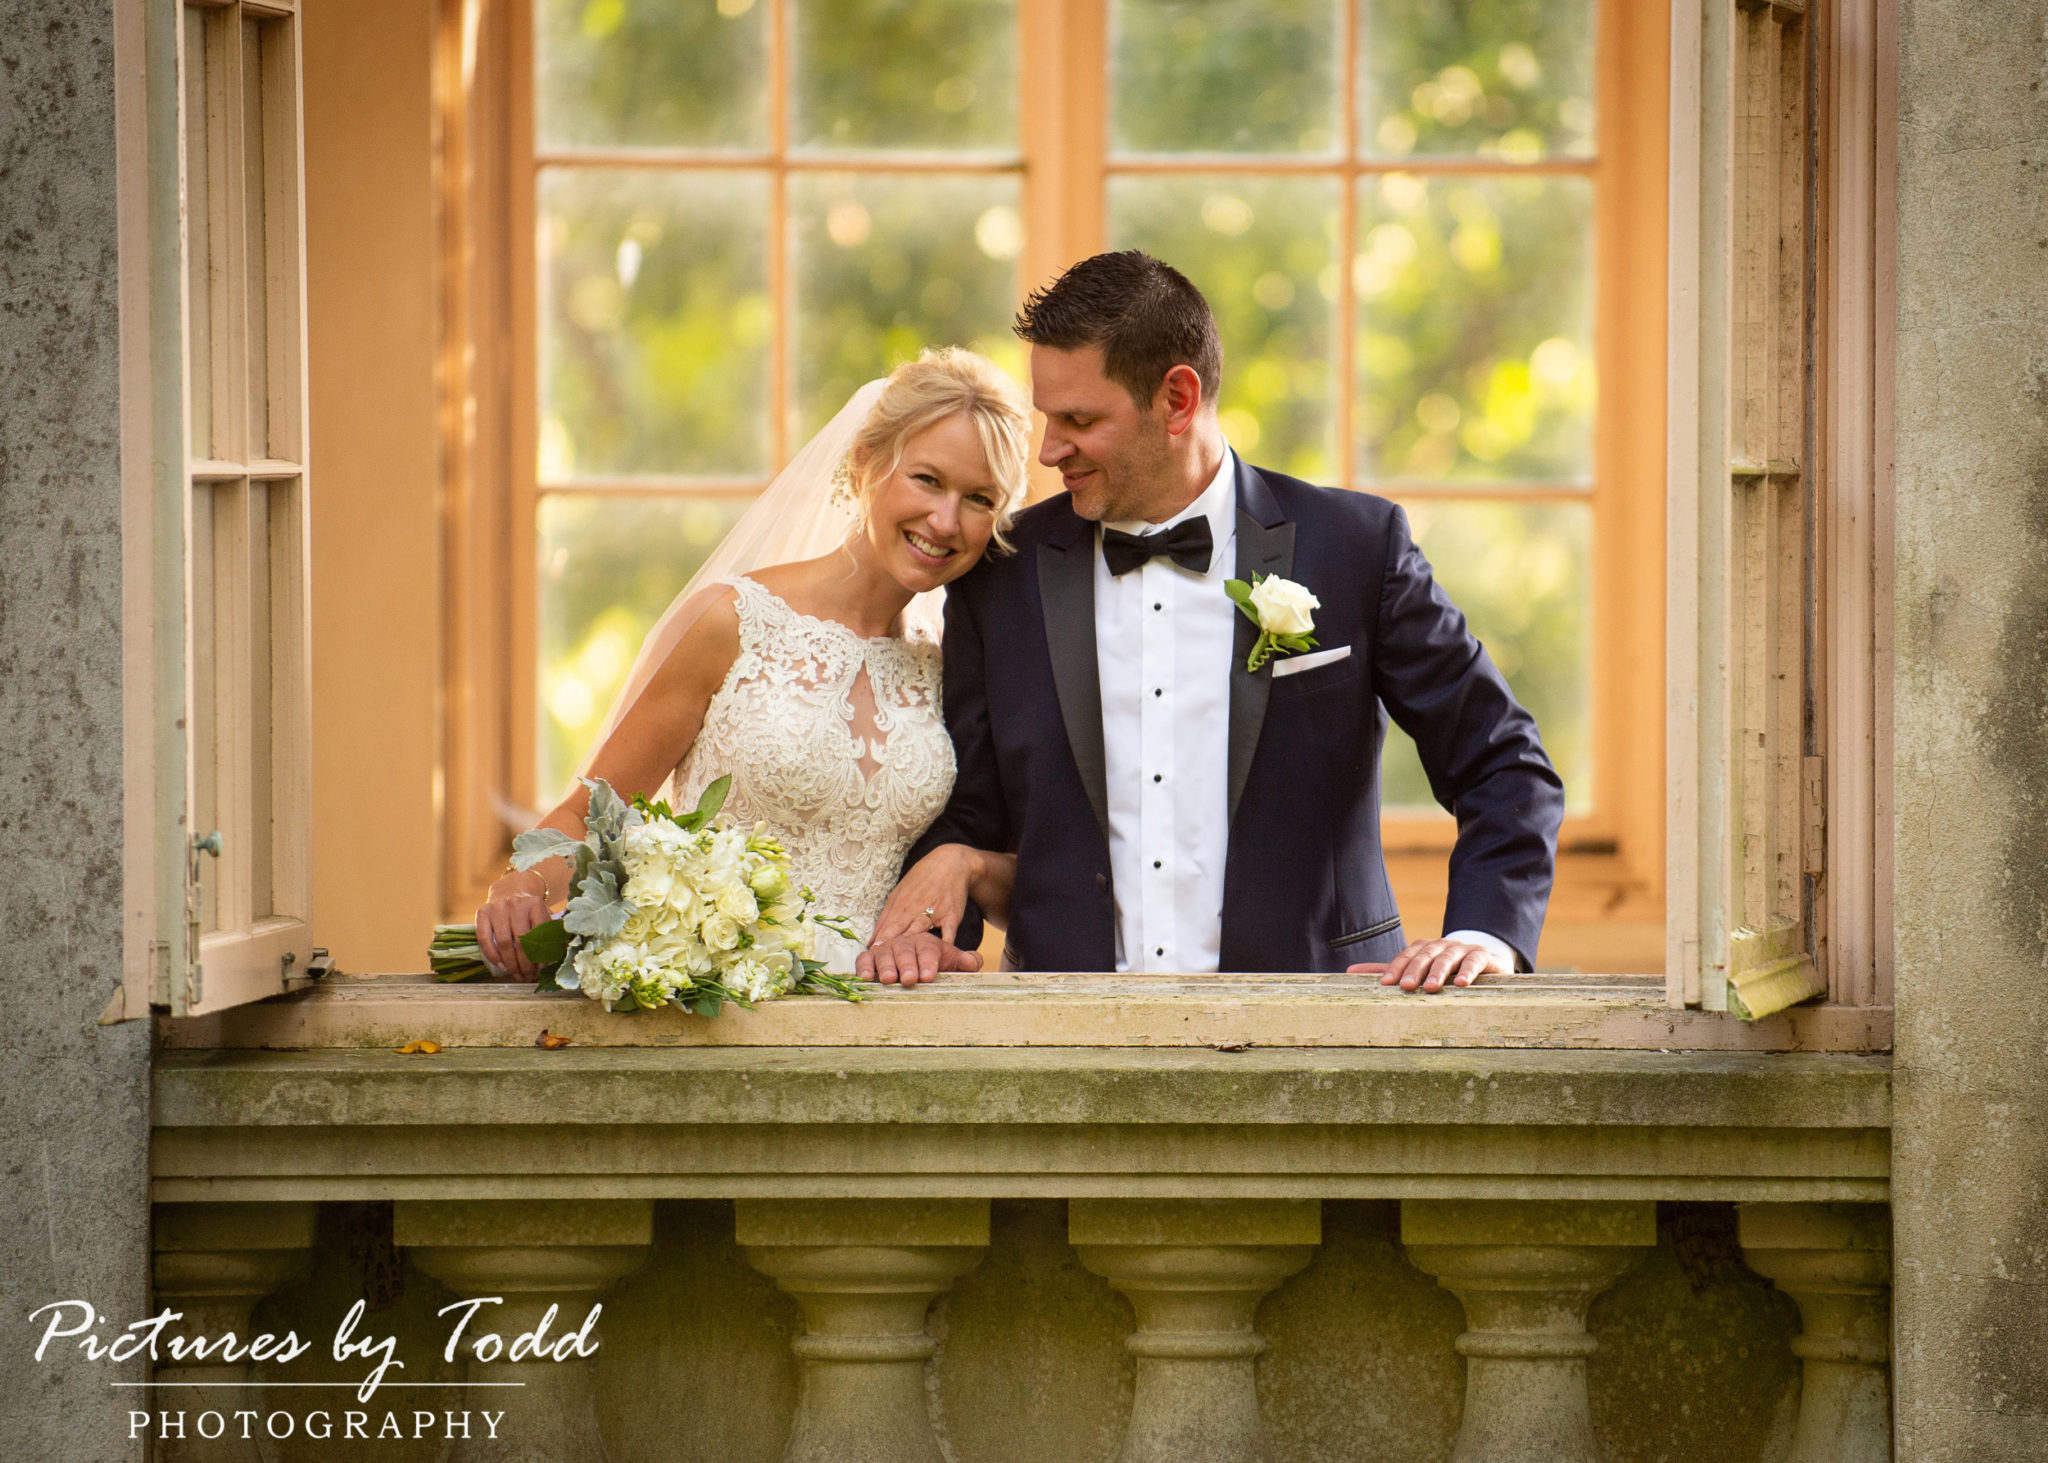 Lisa & Dan's Winterthur Wedding